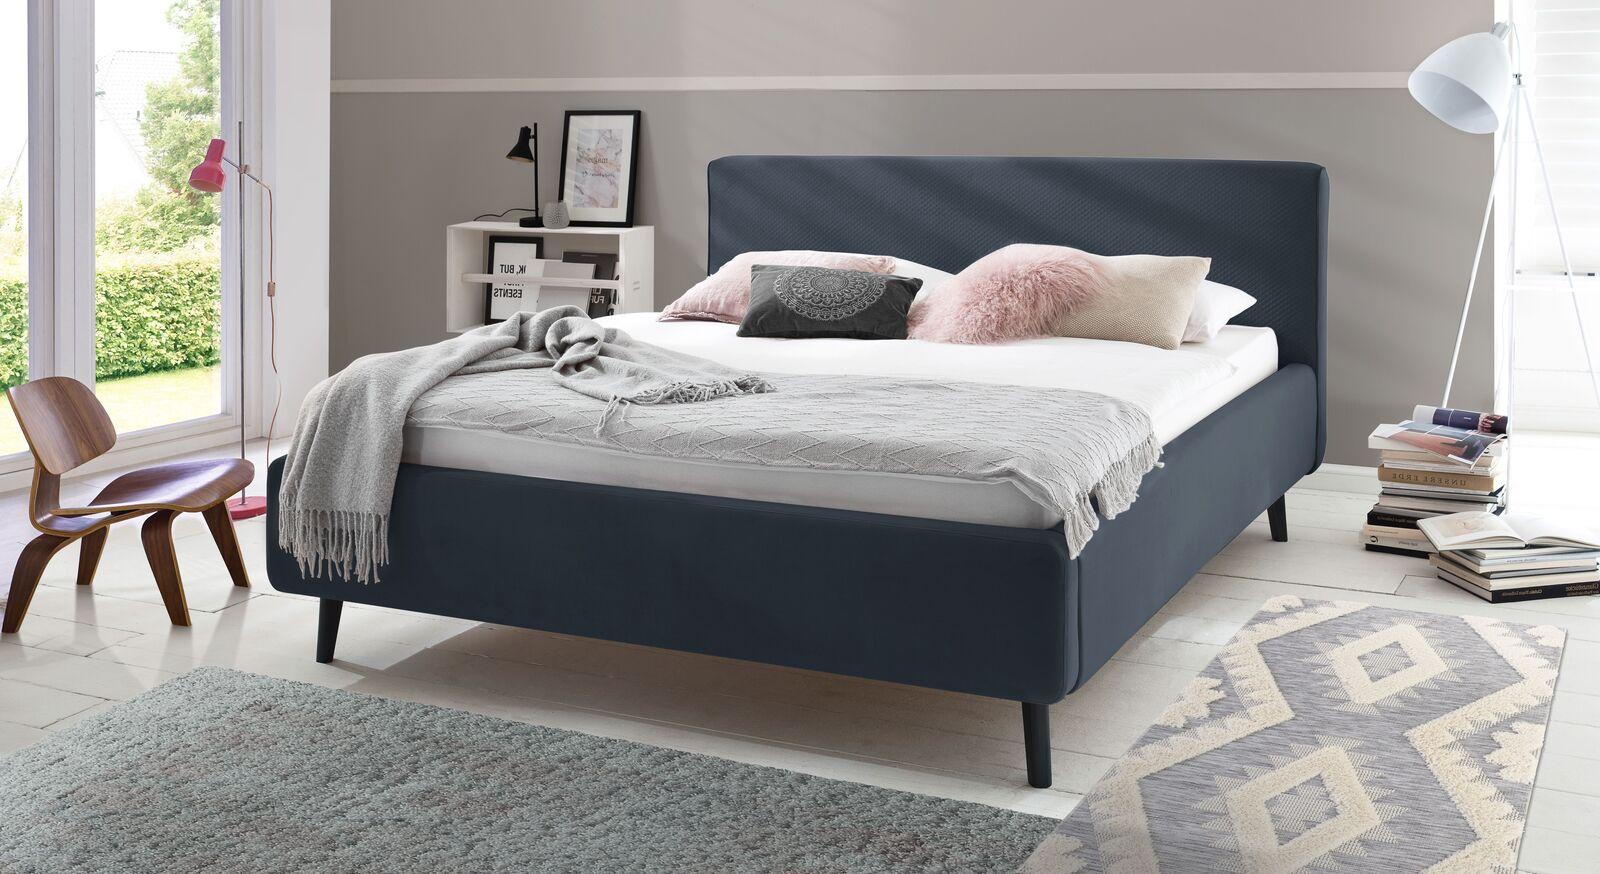 Bett Inara mit dunkelblauem Samtbezug